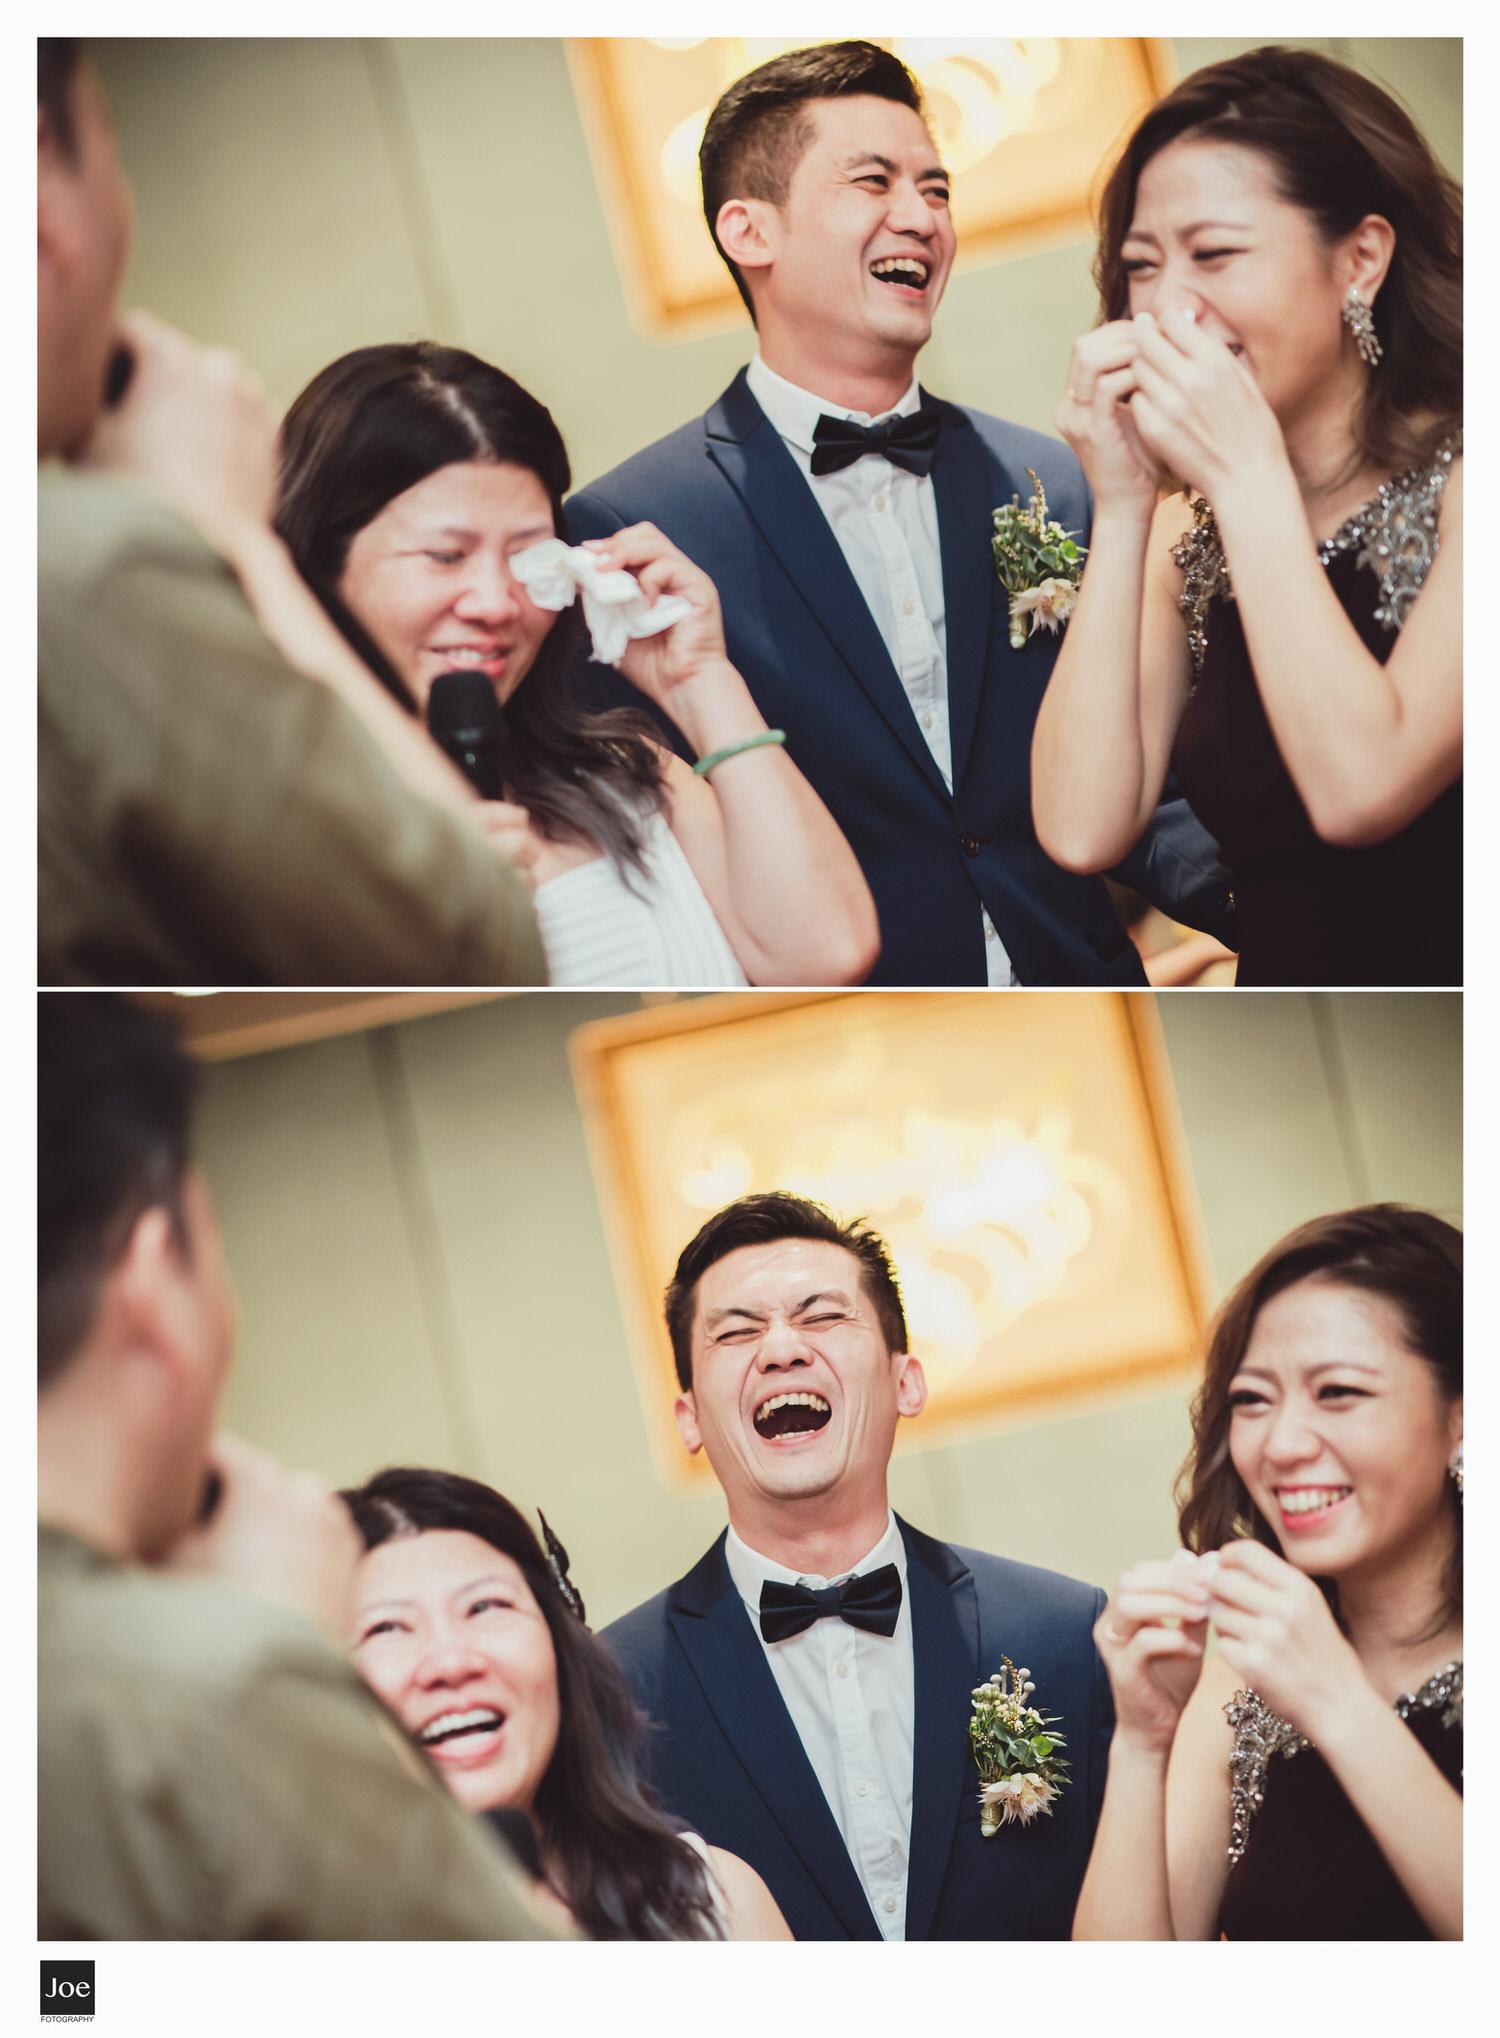 wedding-photography-shangri-la-far-eastern-plaza-hotel-ariel-sam-joe-fotography-173.jpg